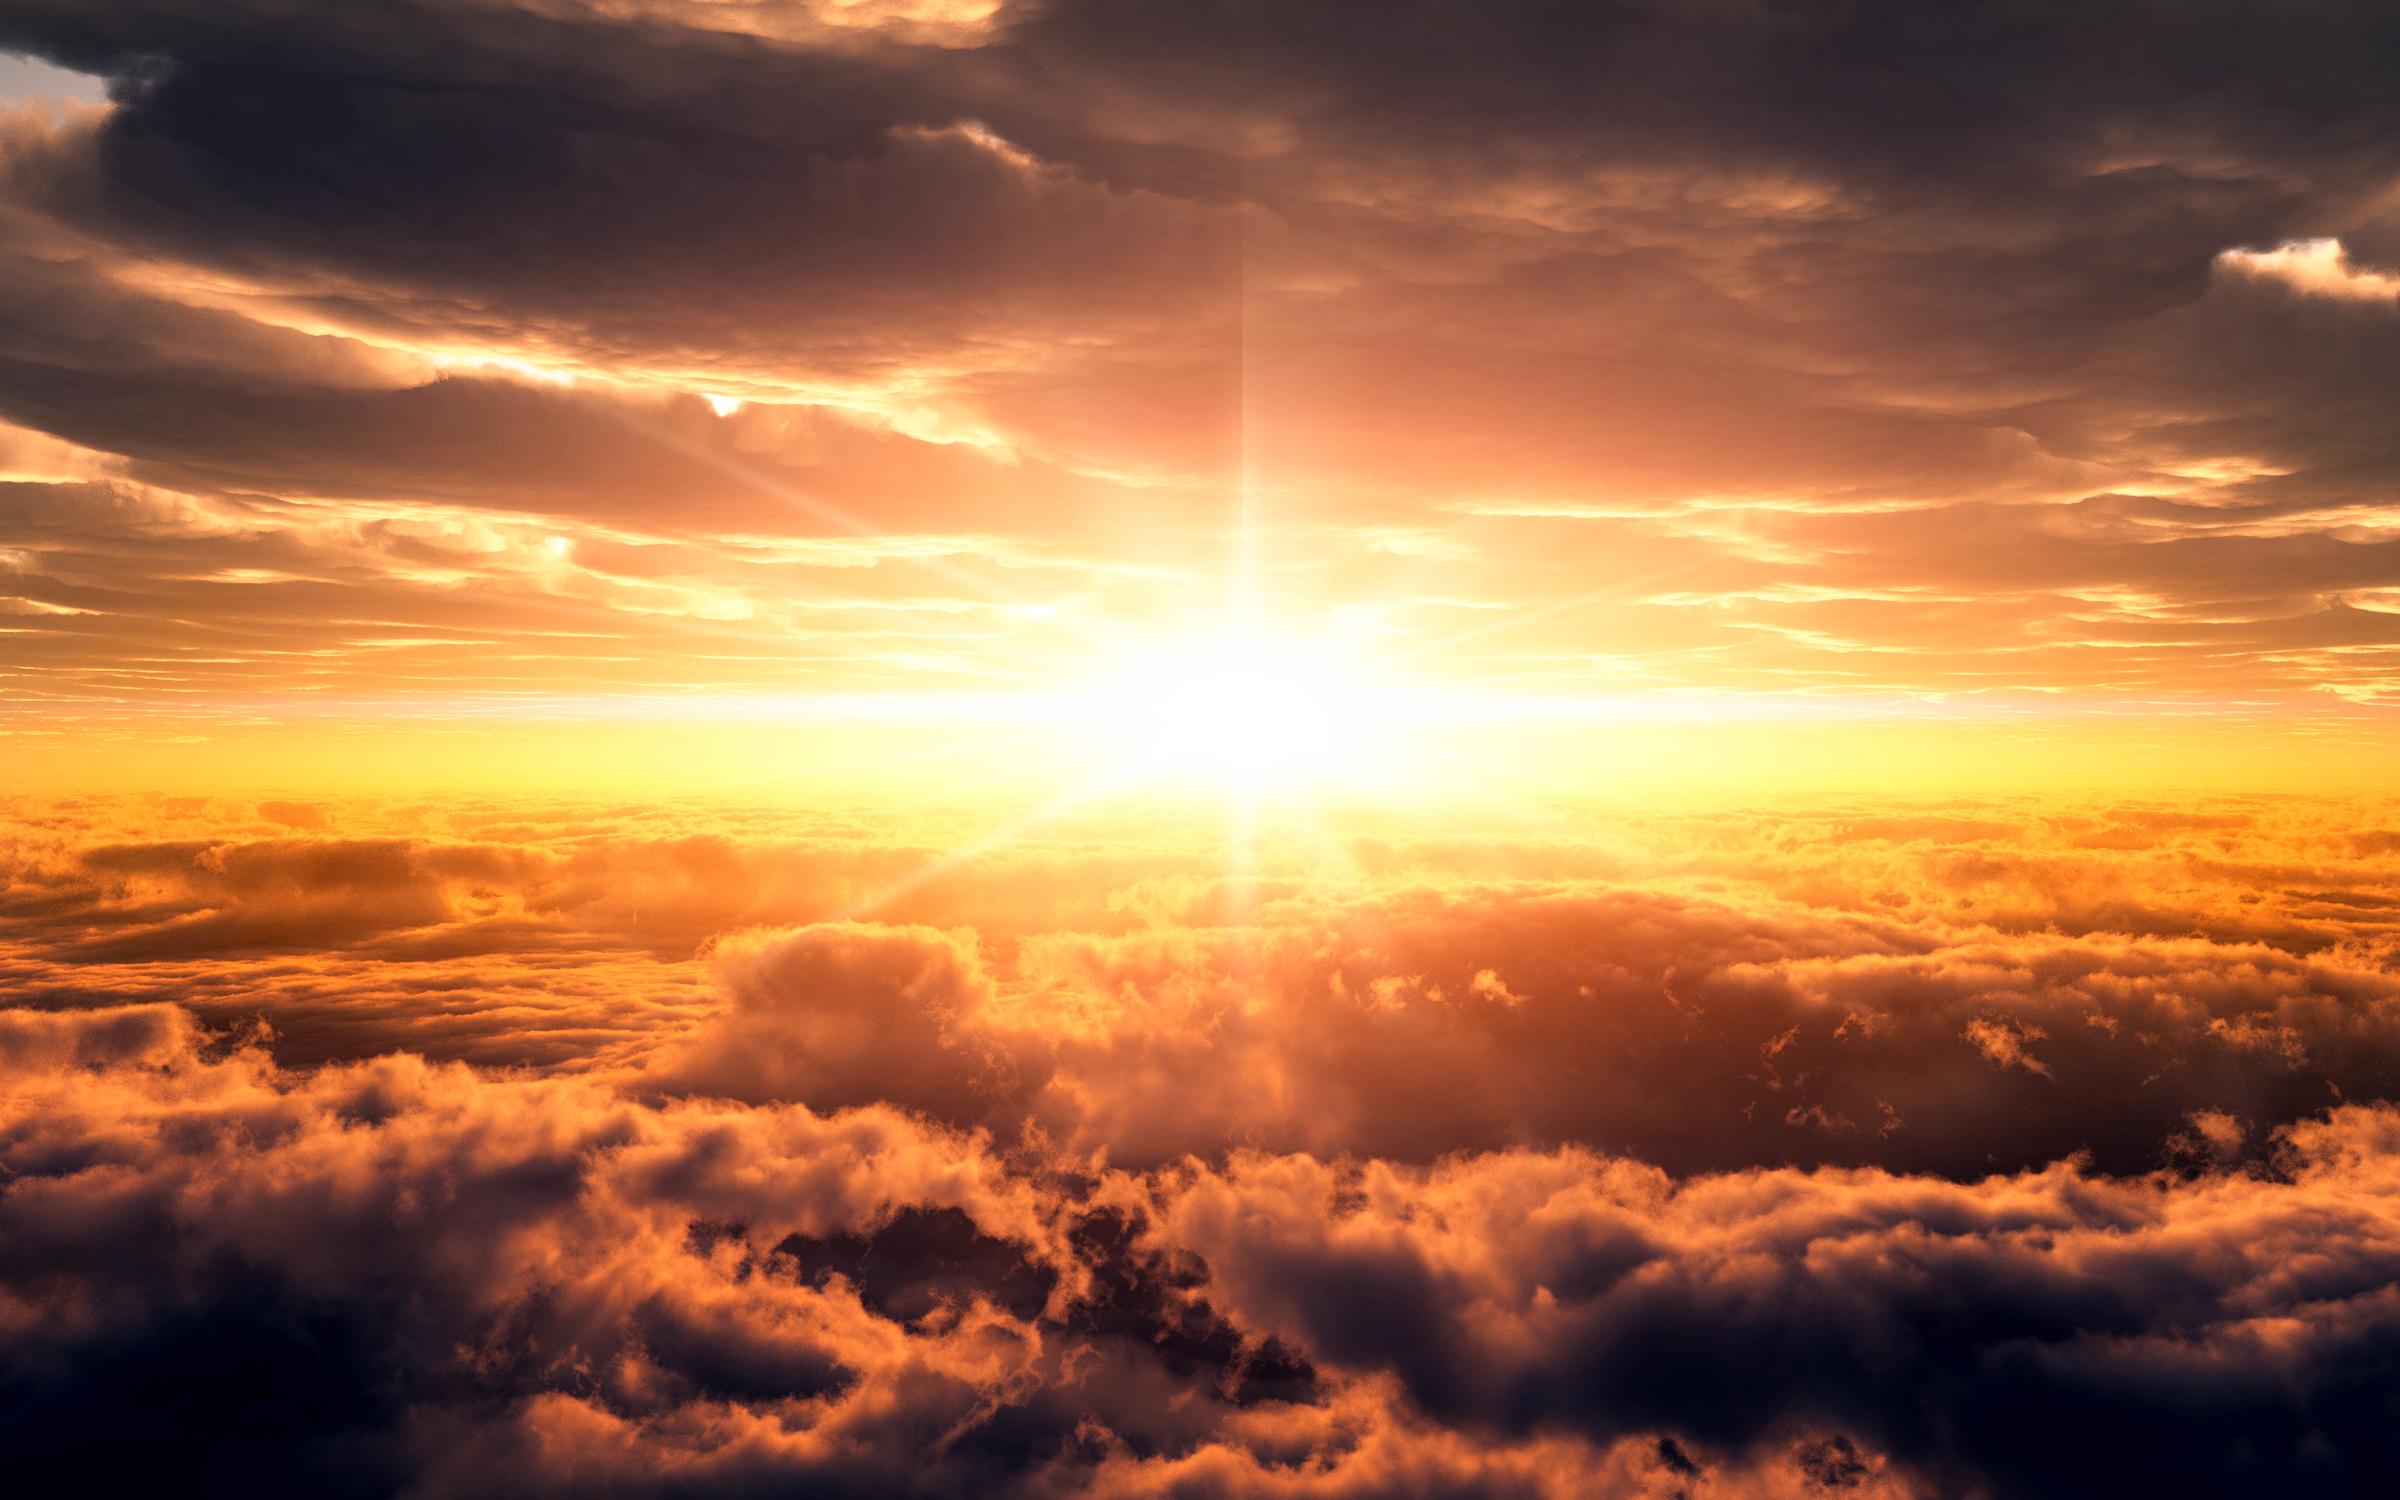 sunrise-sky-clouds-2400x1500